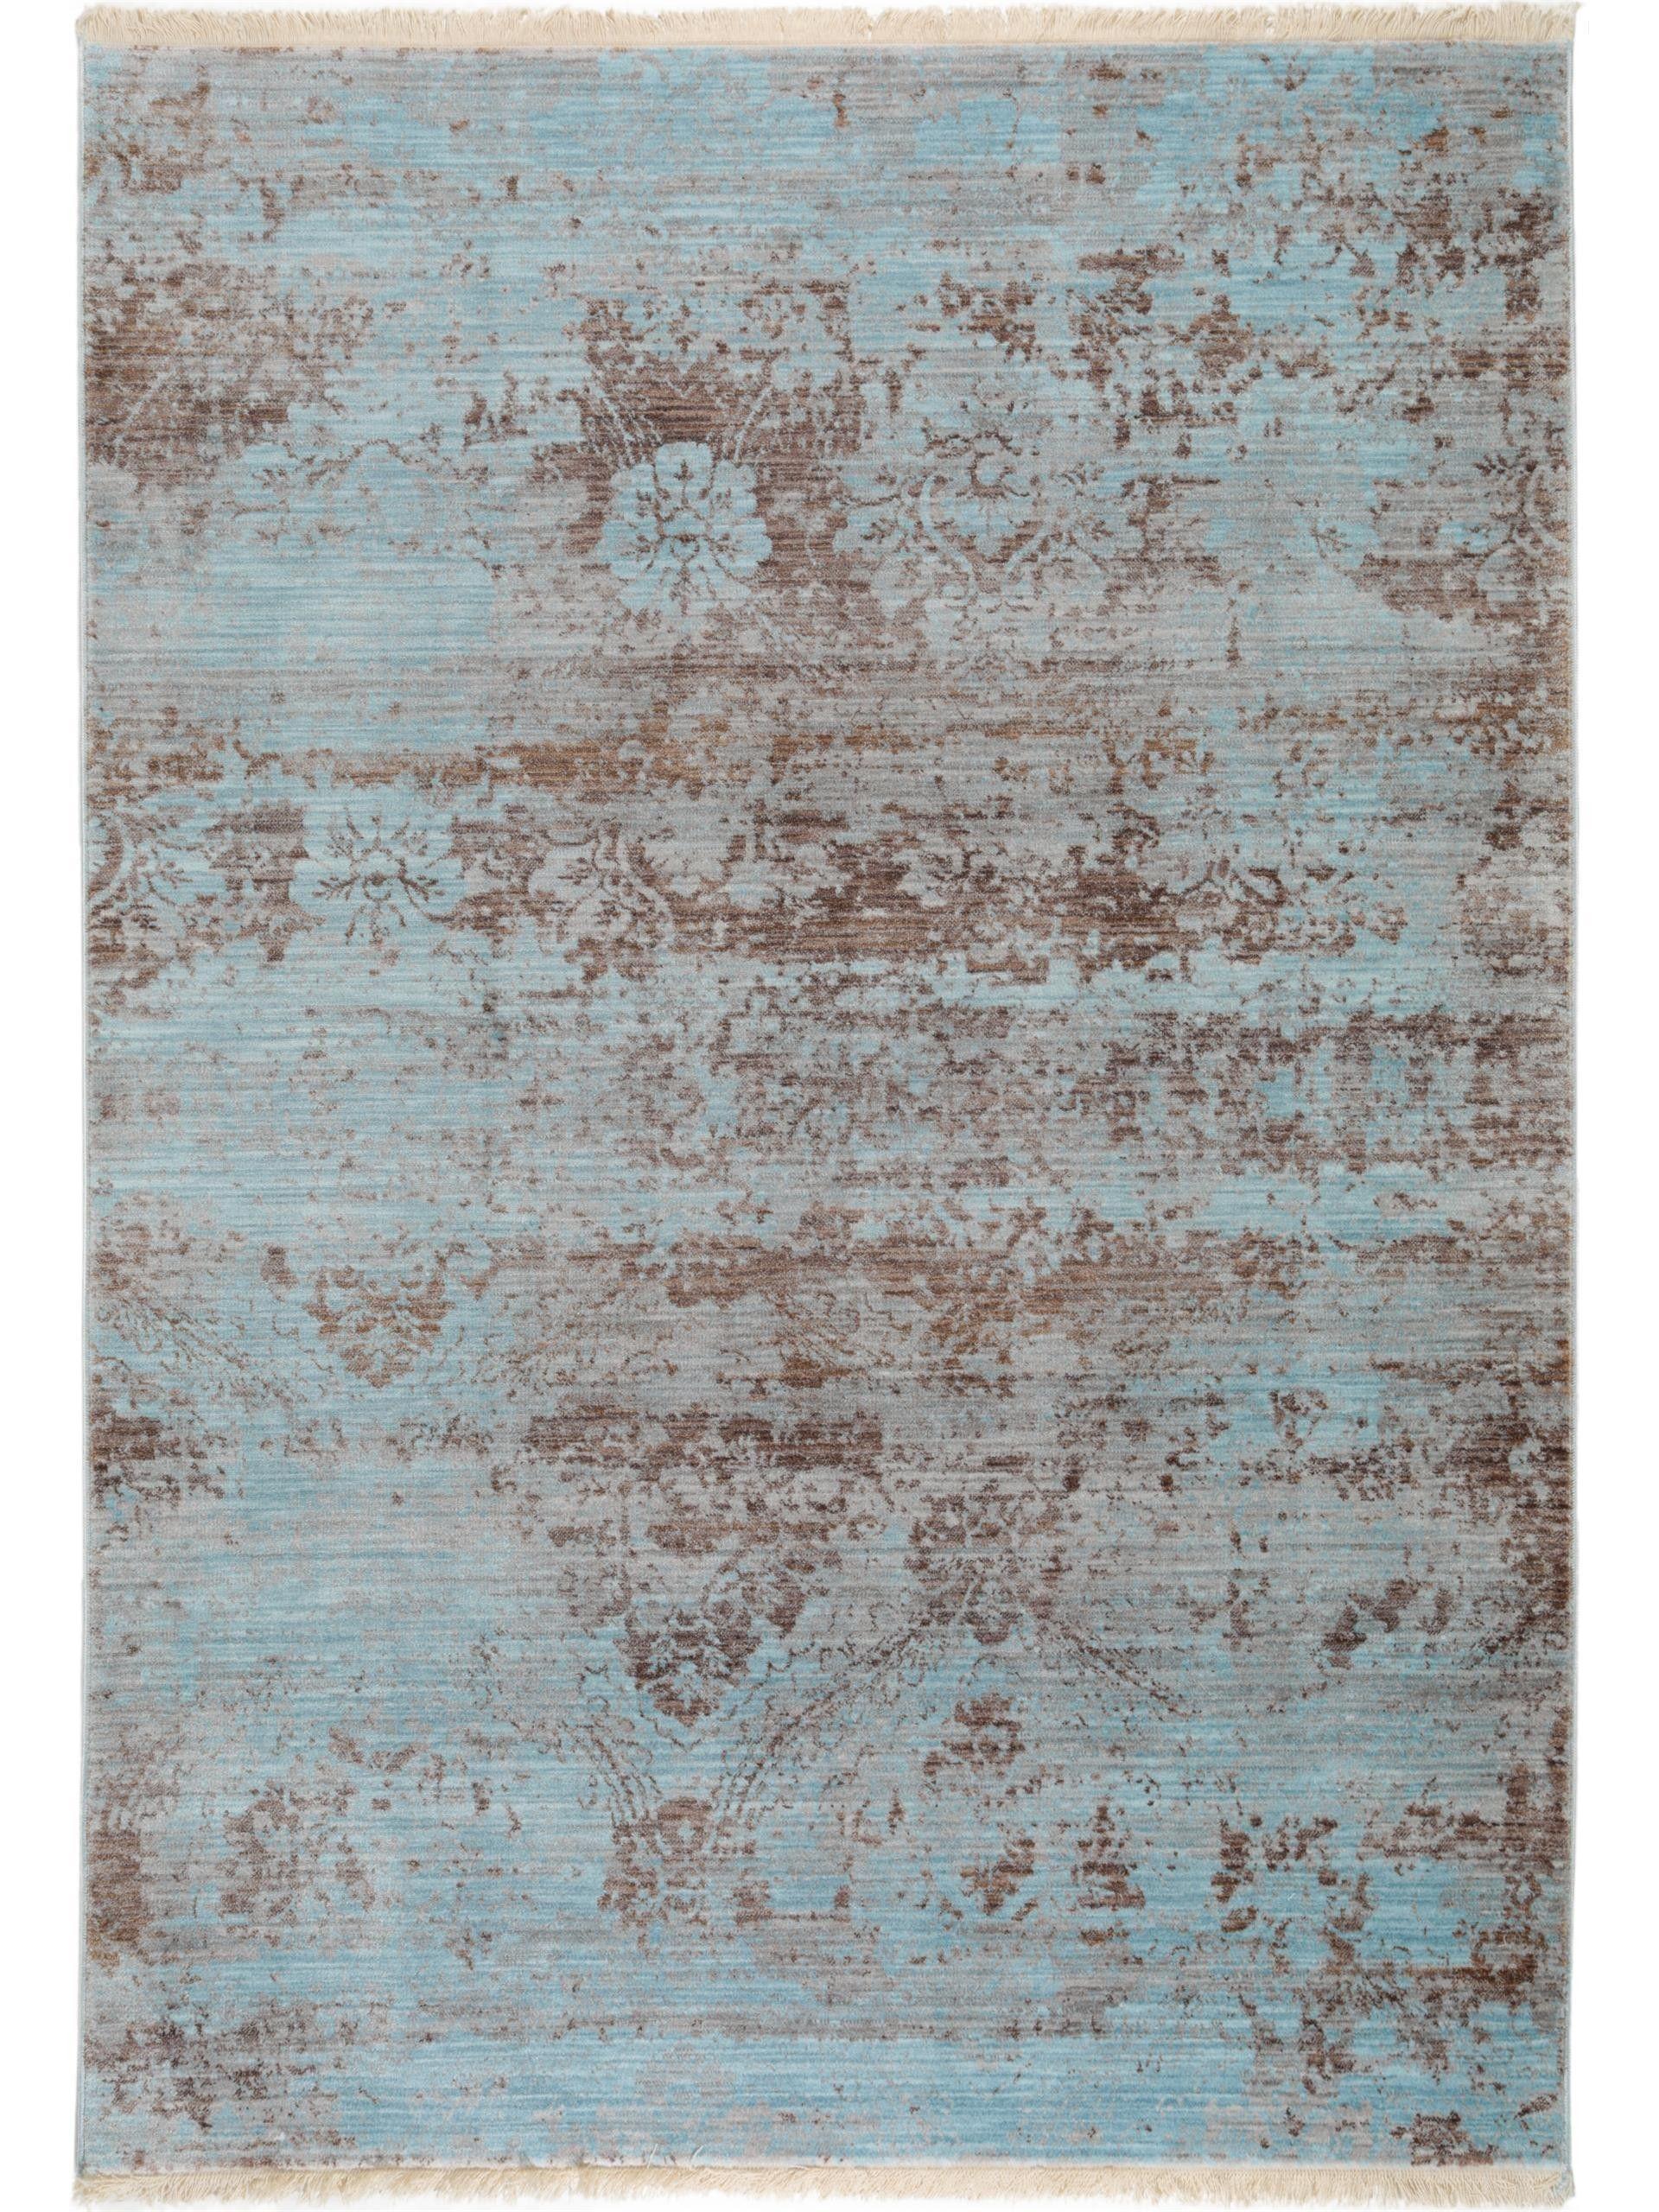 Teppich Vintage Safira Blau | Teppiche | Pinterest | Teppiche ...